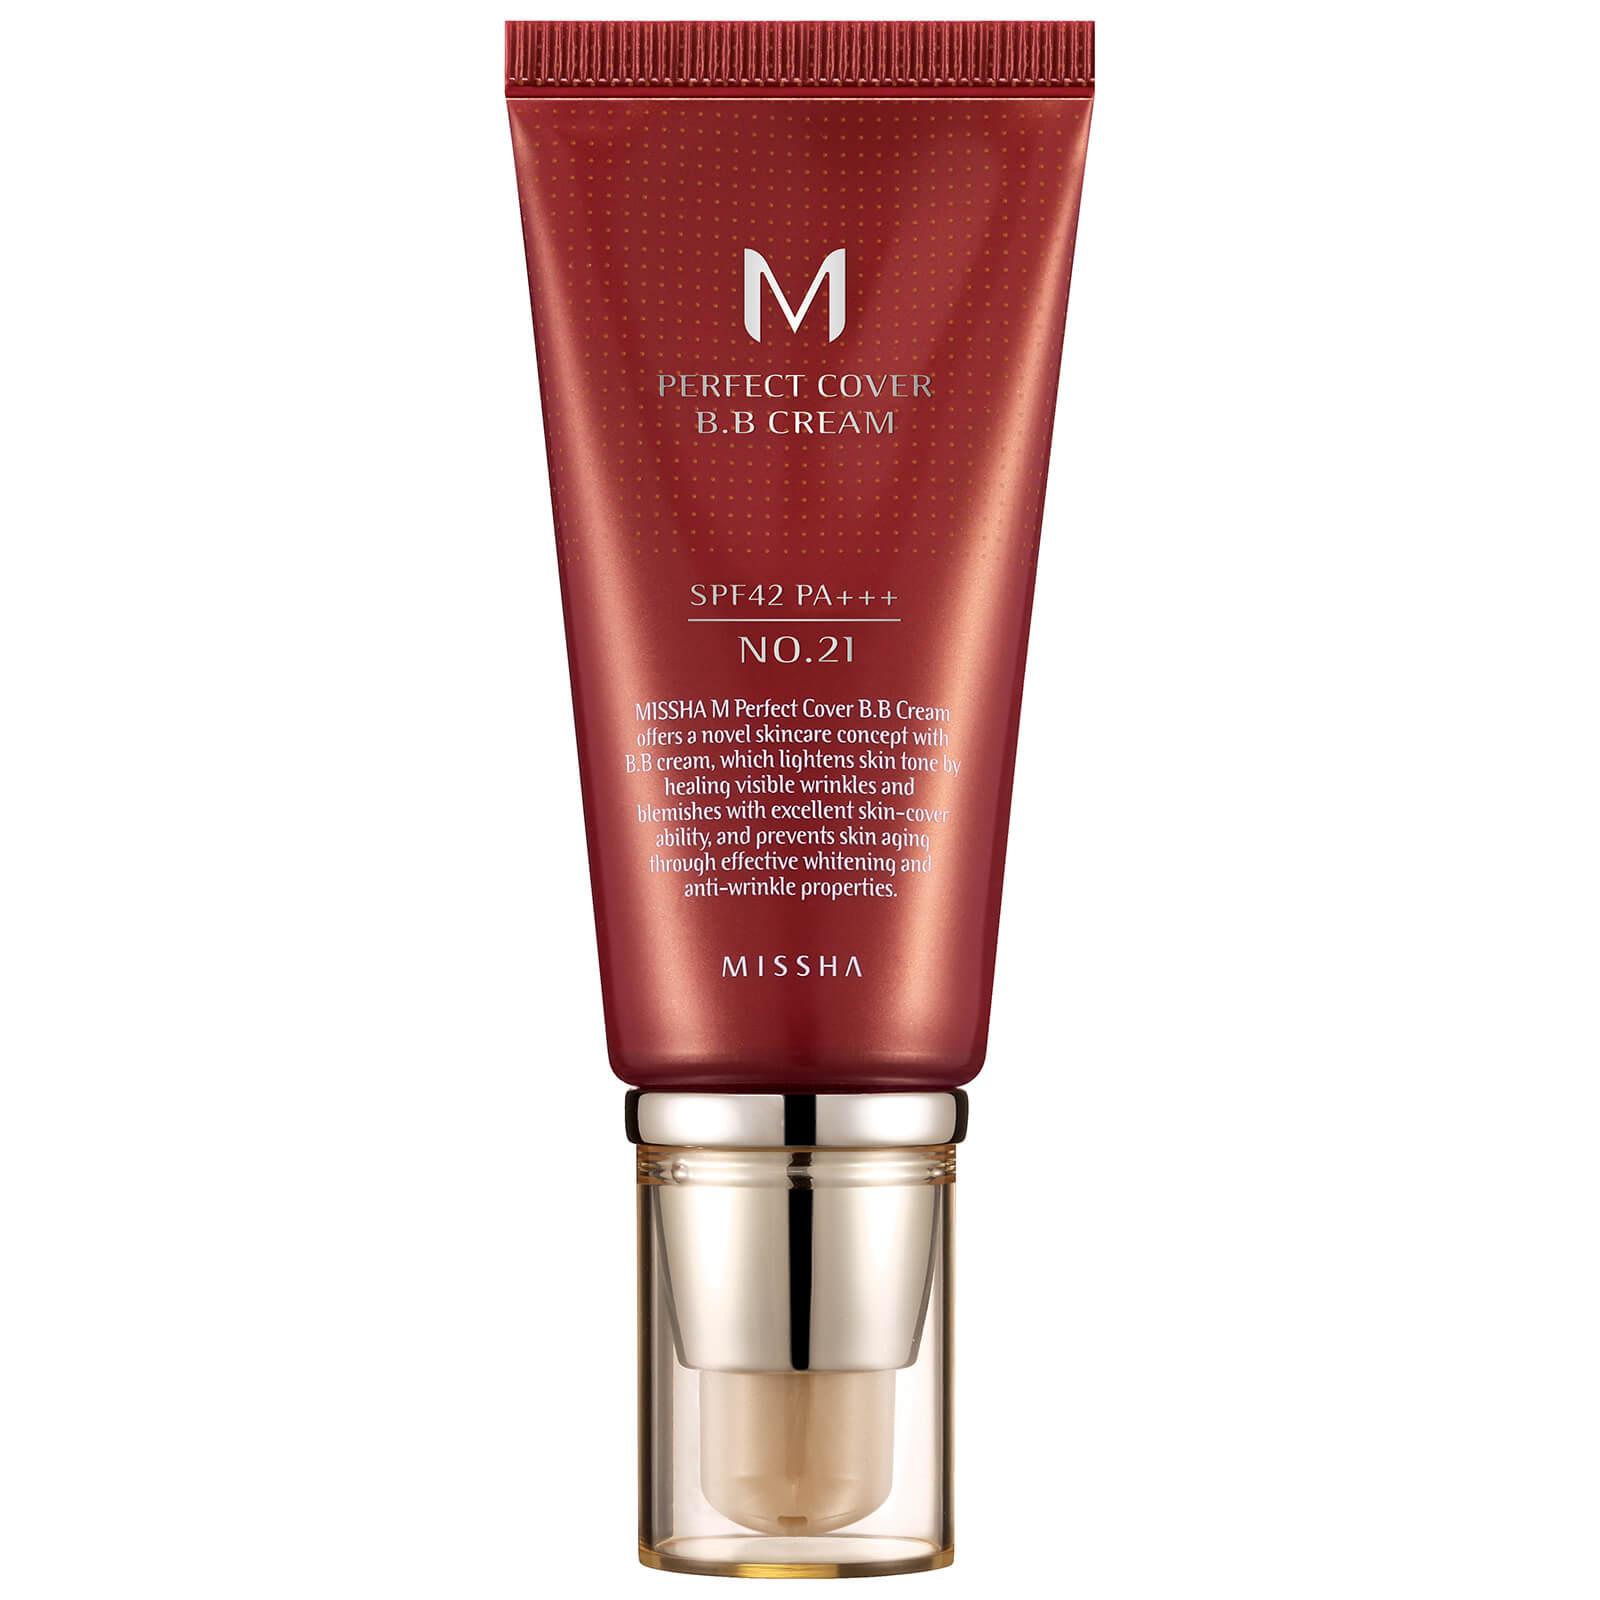 Купить MISSHA M Perfect Cover BB Cream SPF42/PA+++ - No.21/Light Beige 50ml